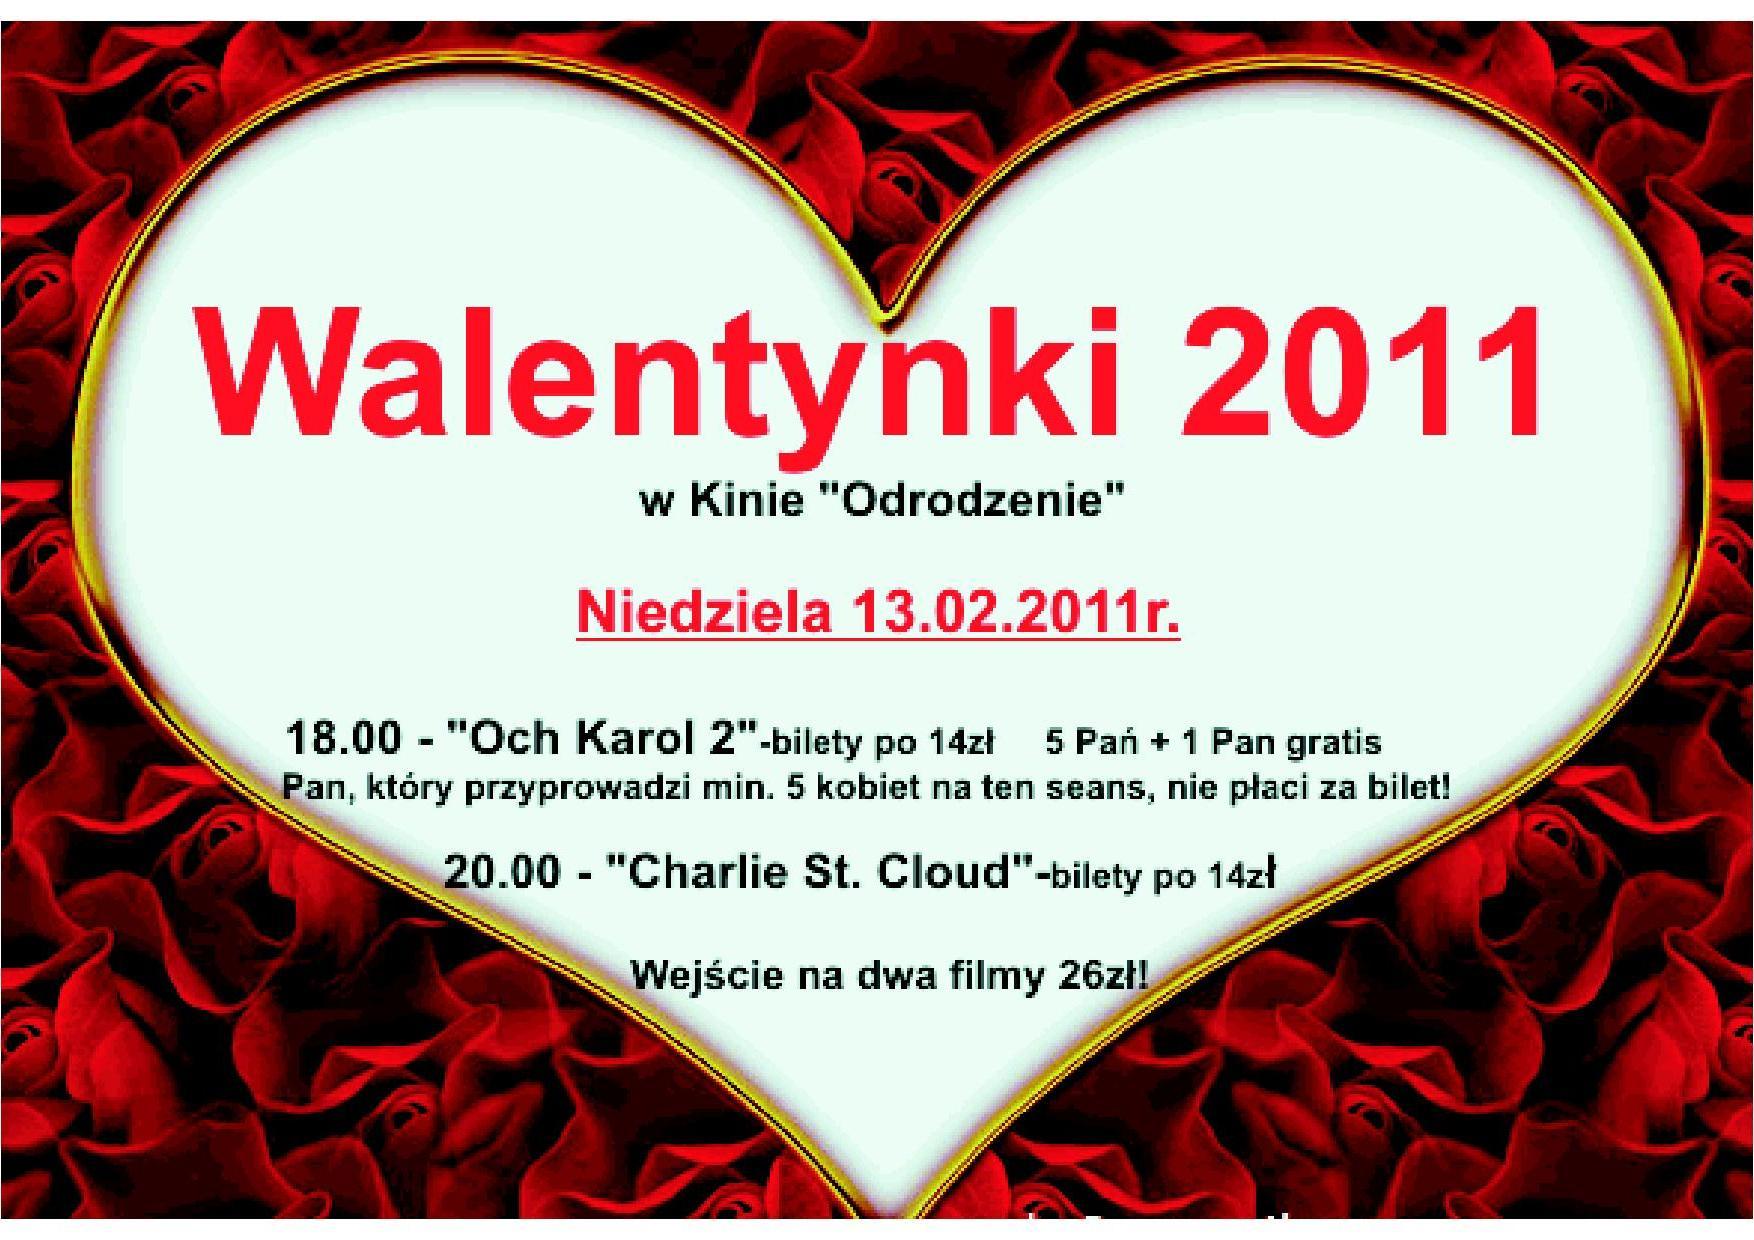 Walentynki 2011.jpeg